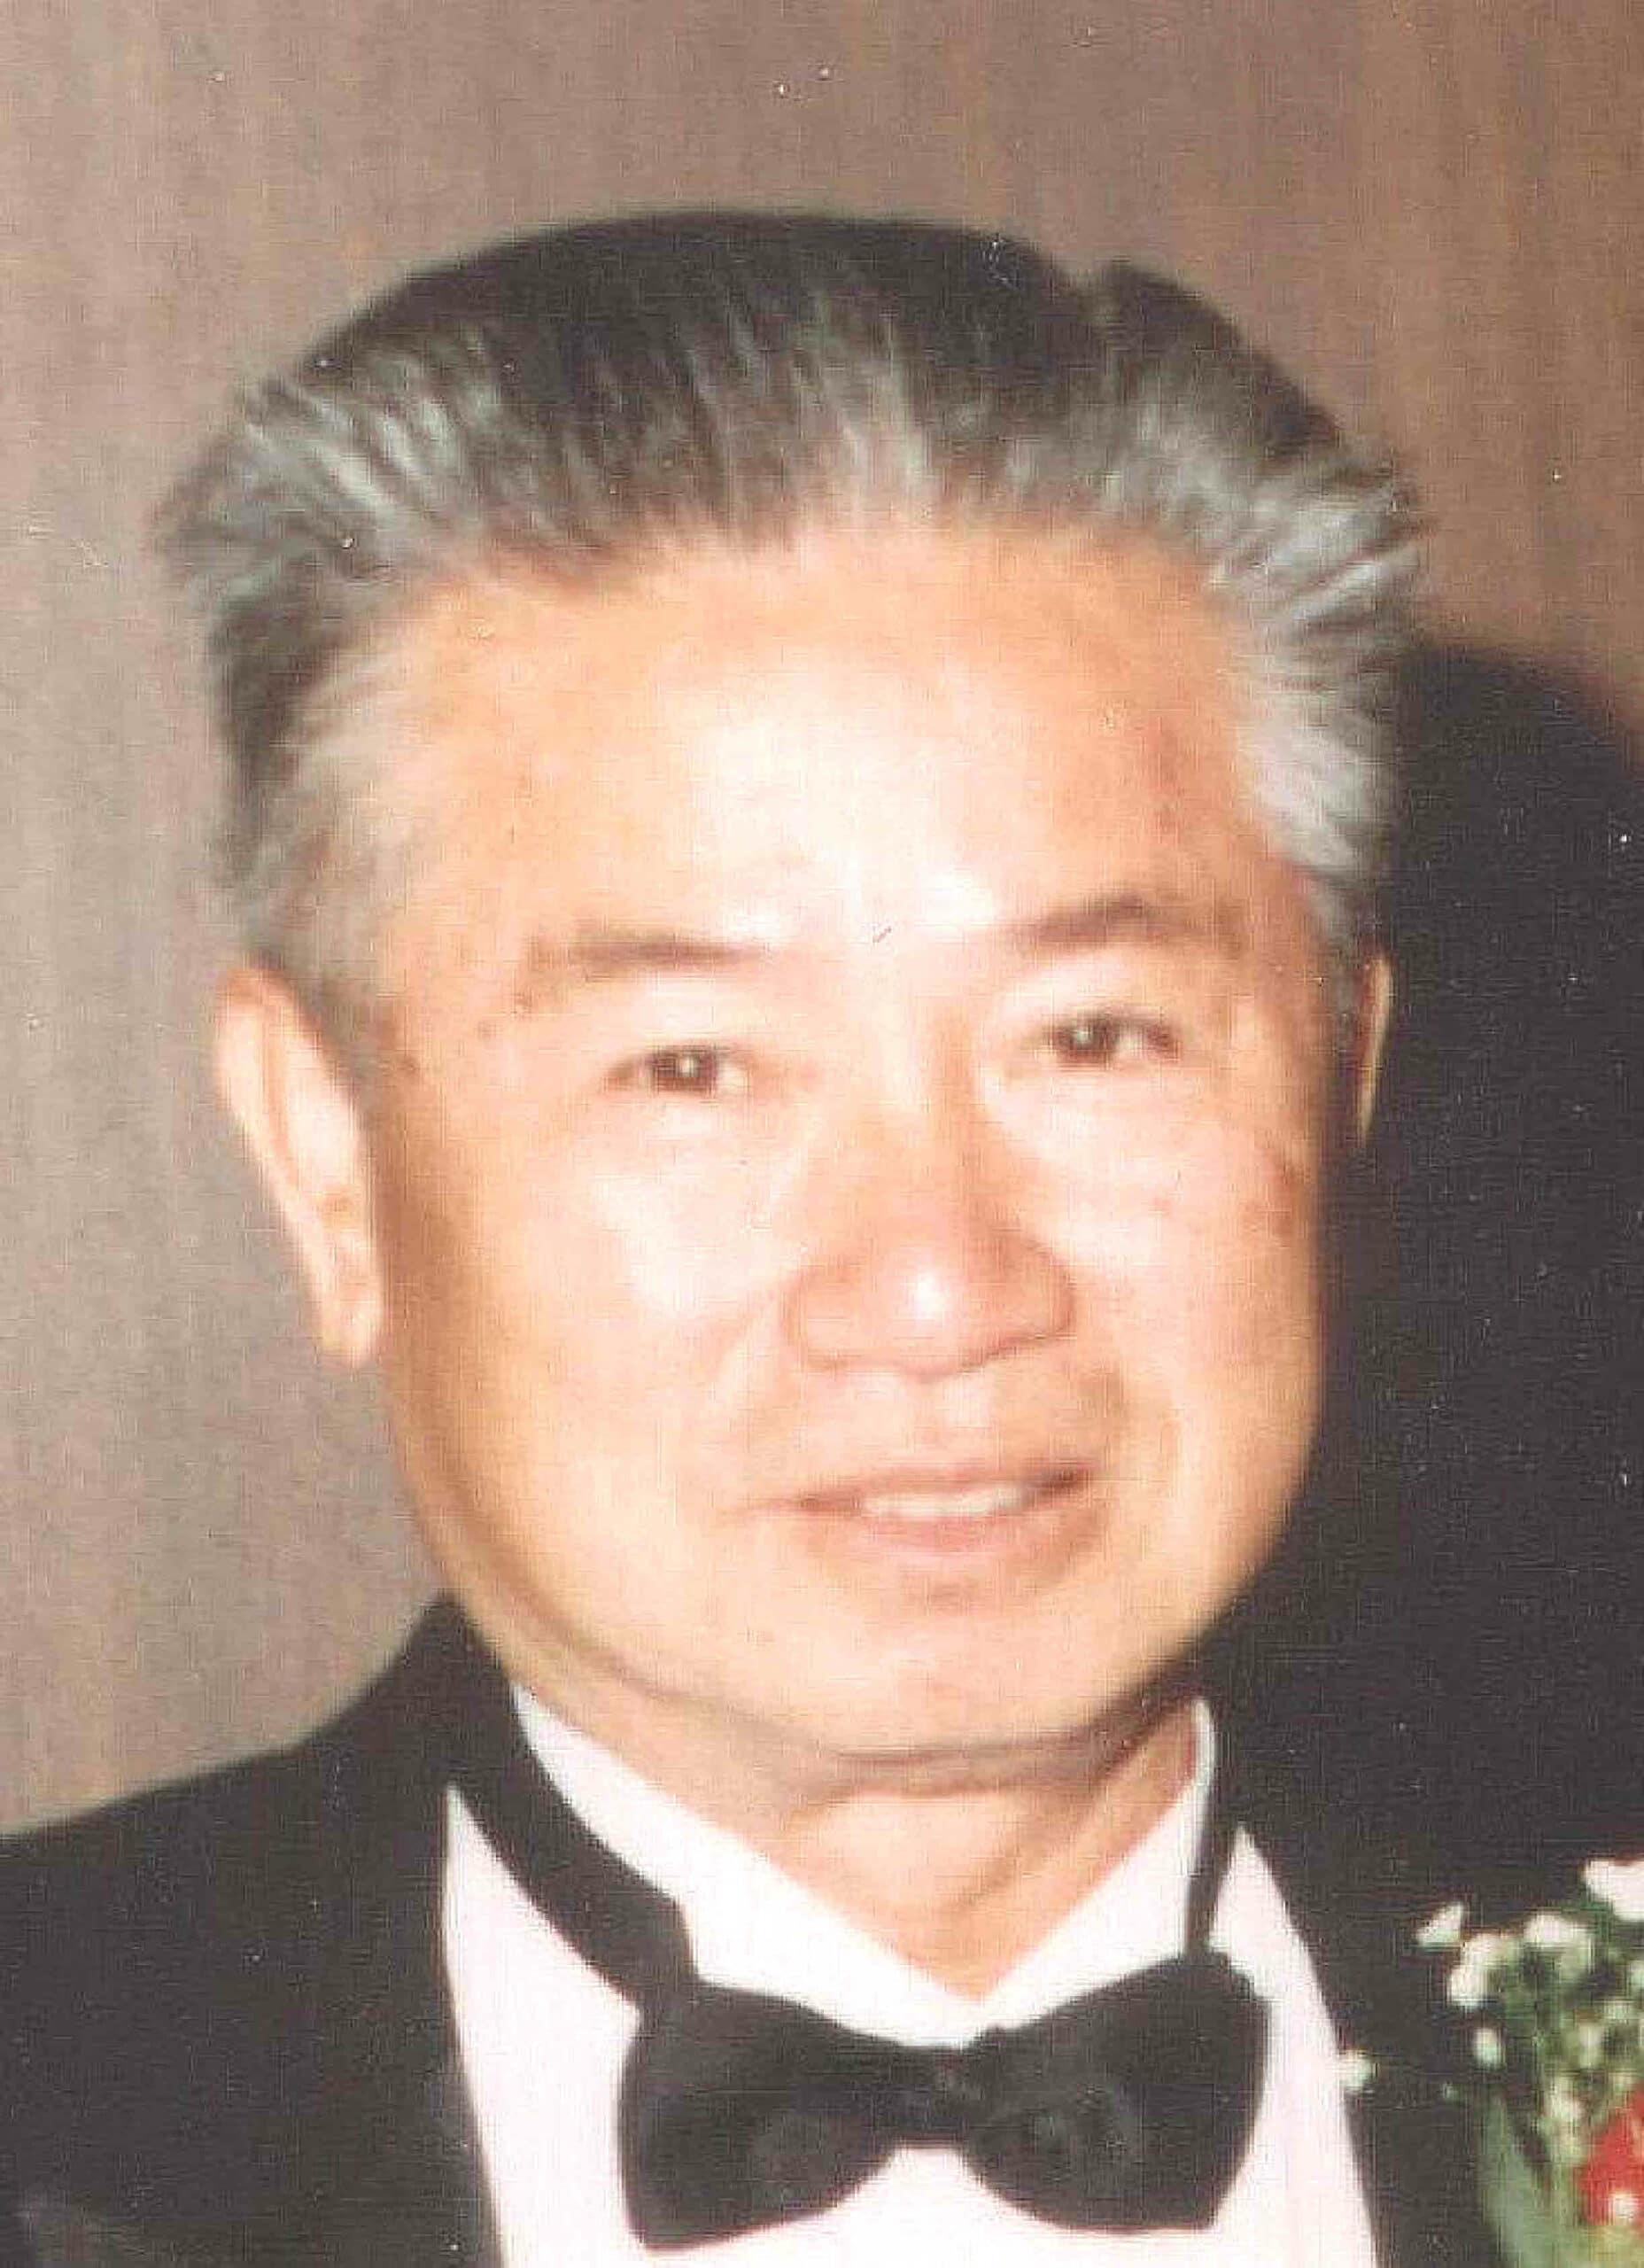 Jack Hom or Kwock Sun Hom Photo